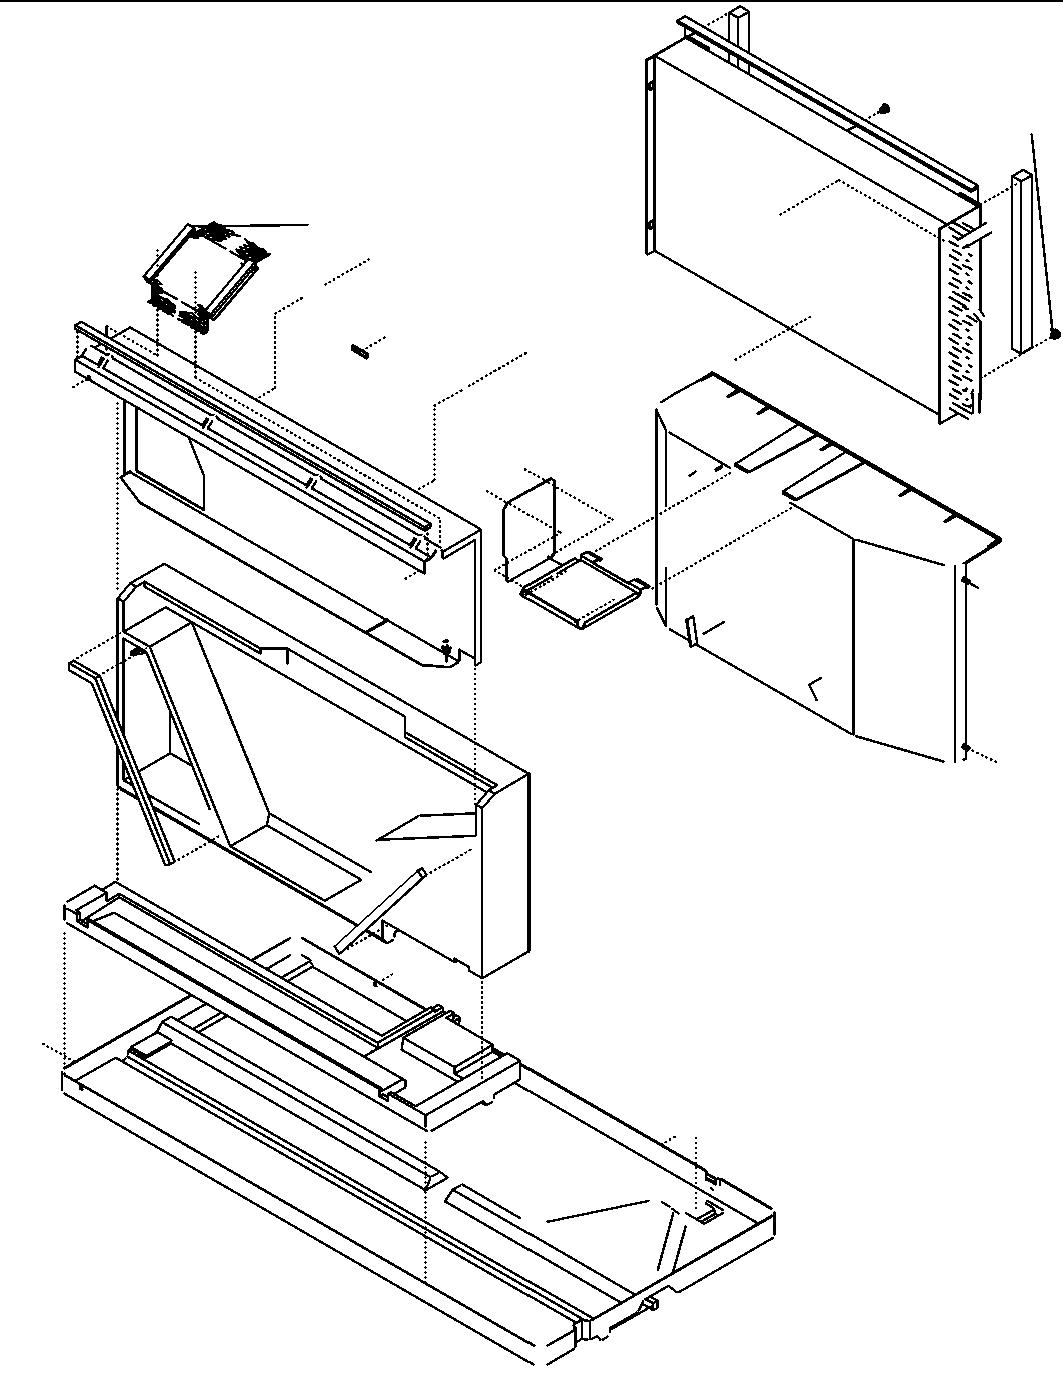 Amana model PTC093A35AC-P1233704R air-conditioner/heat